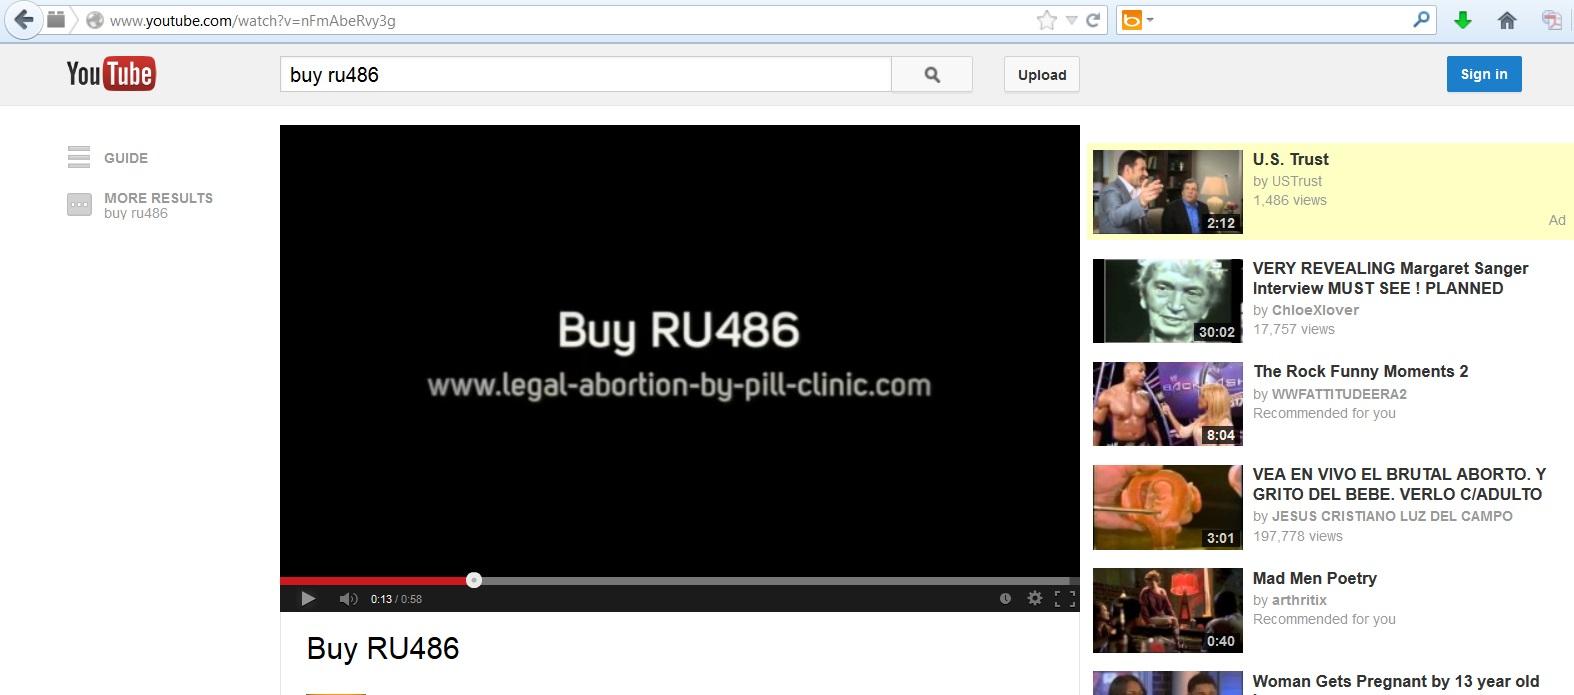 Youtube music video advertising youtube